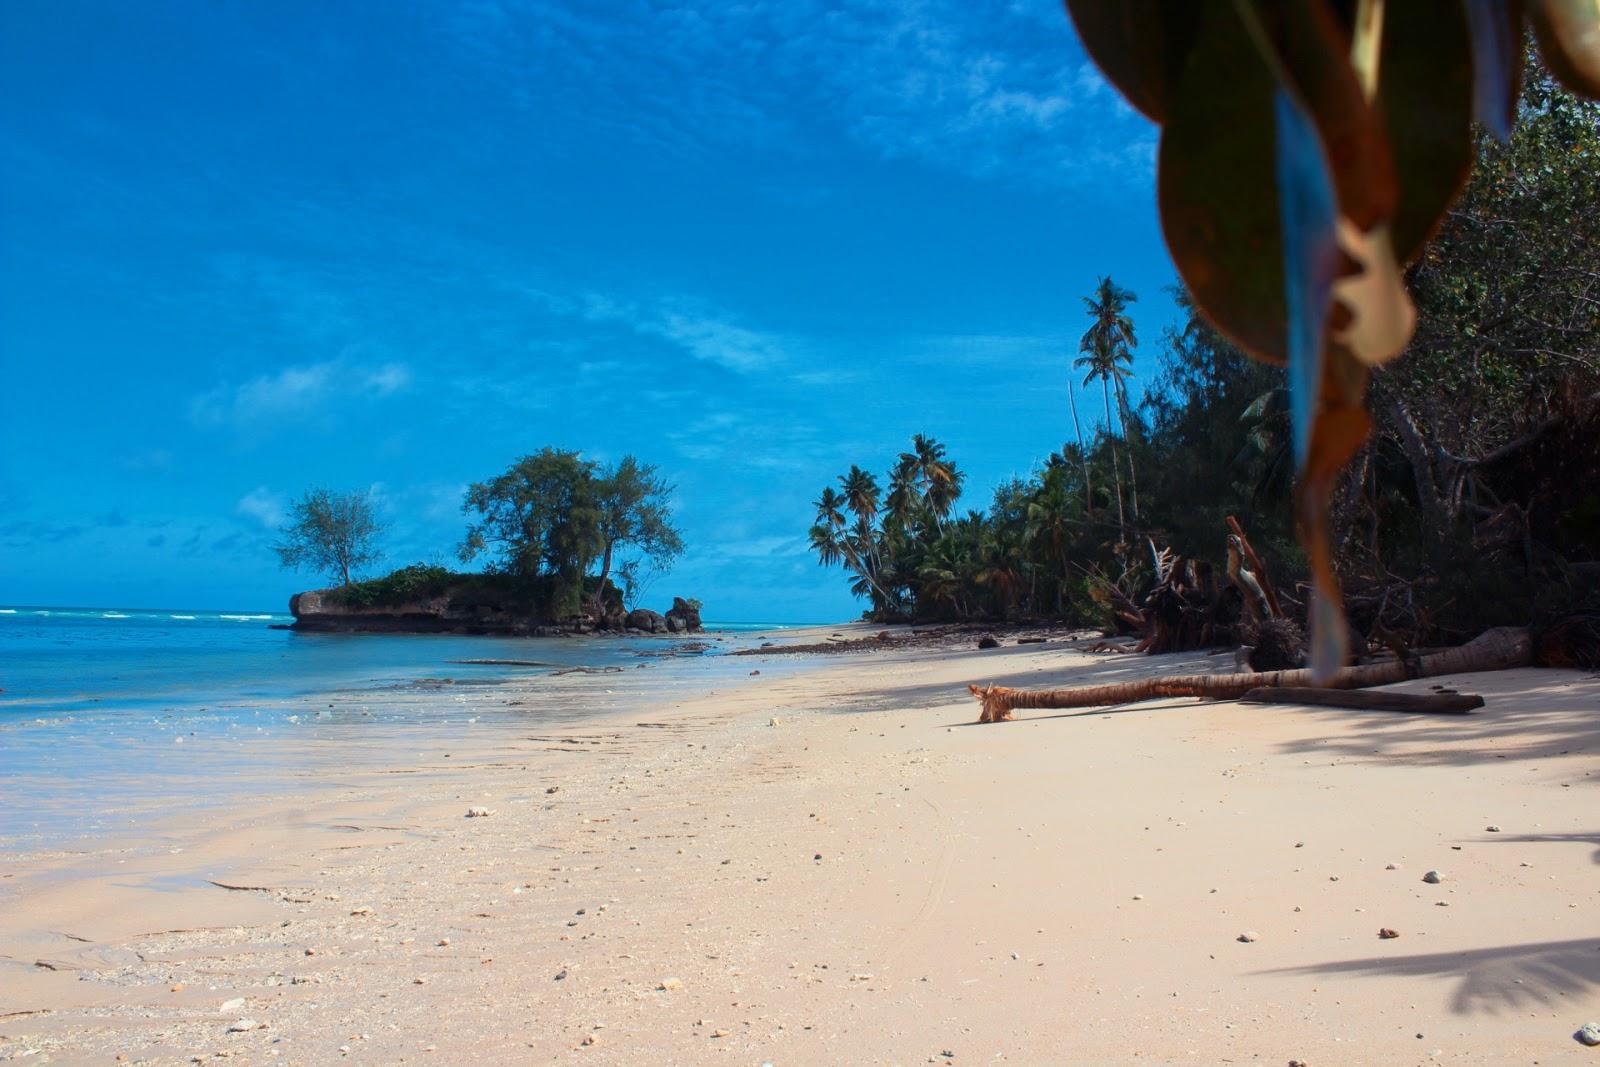 Kora Evar Beach Wisata Alam Di Aru Pantai Batu Kora